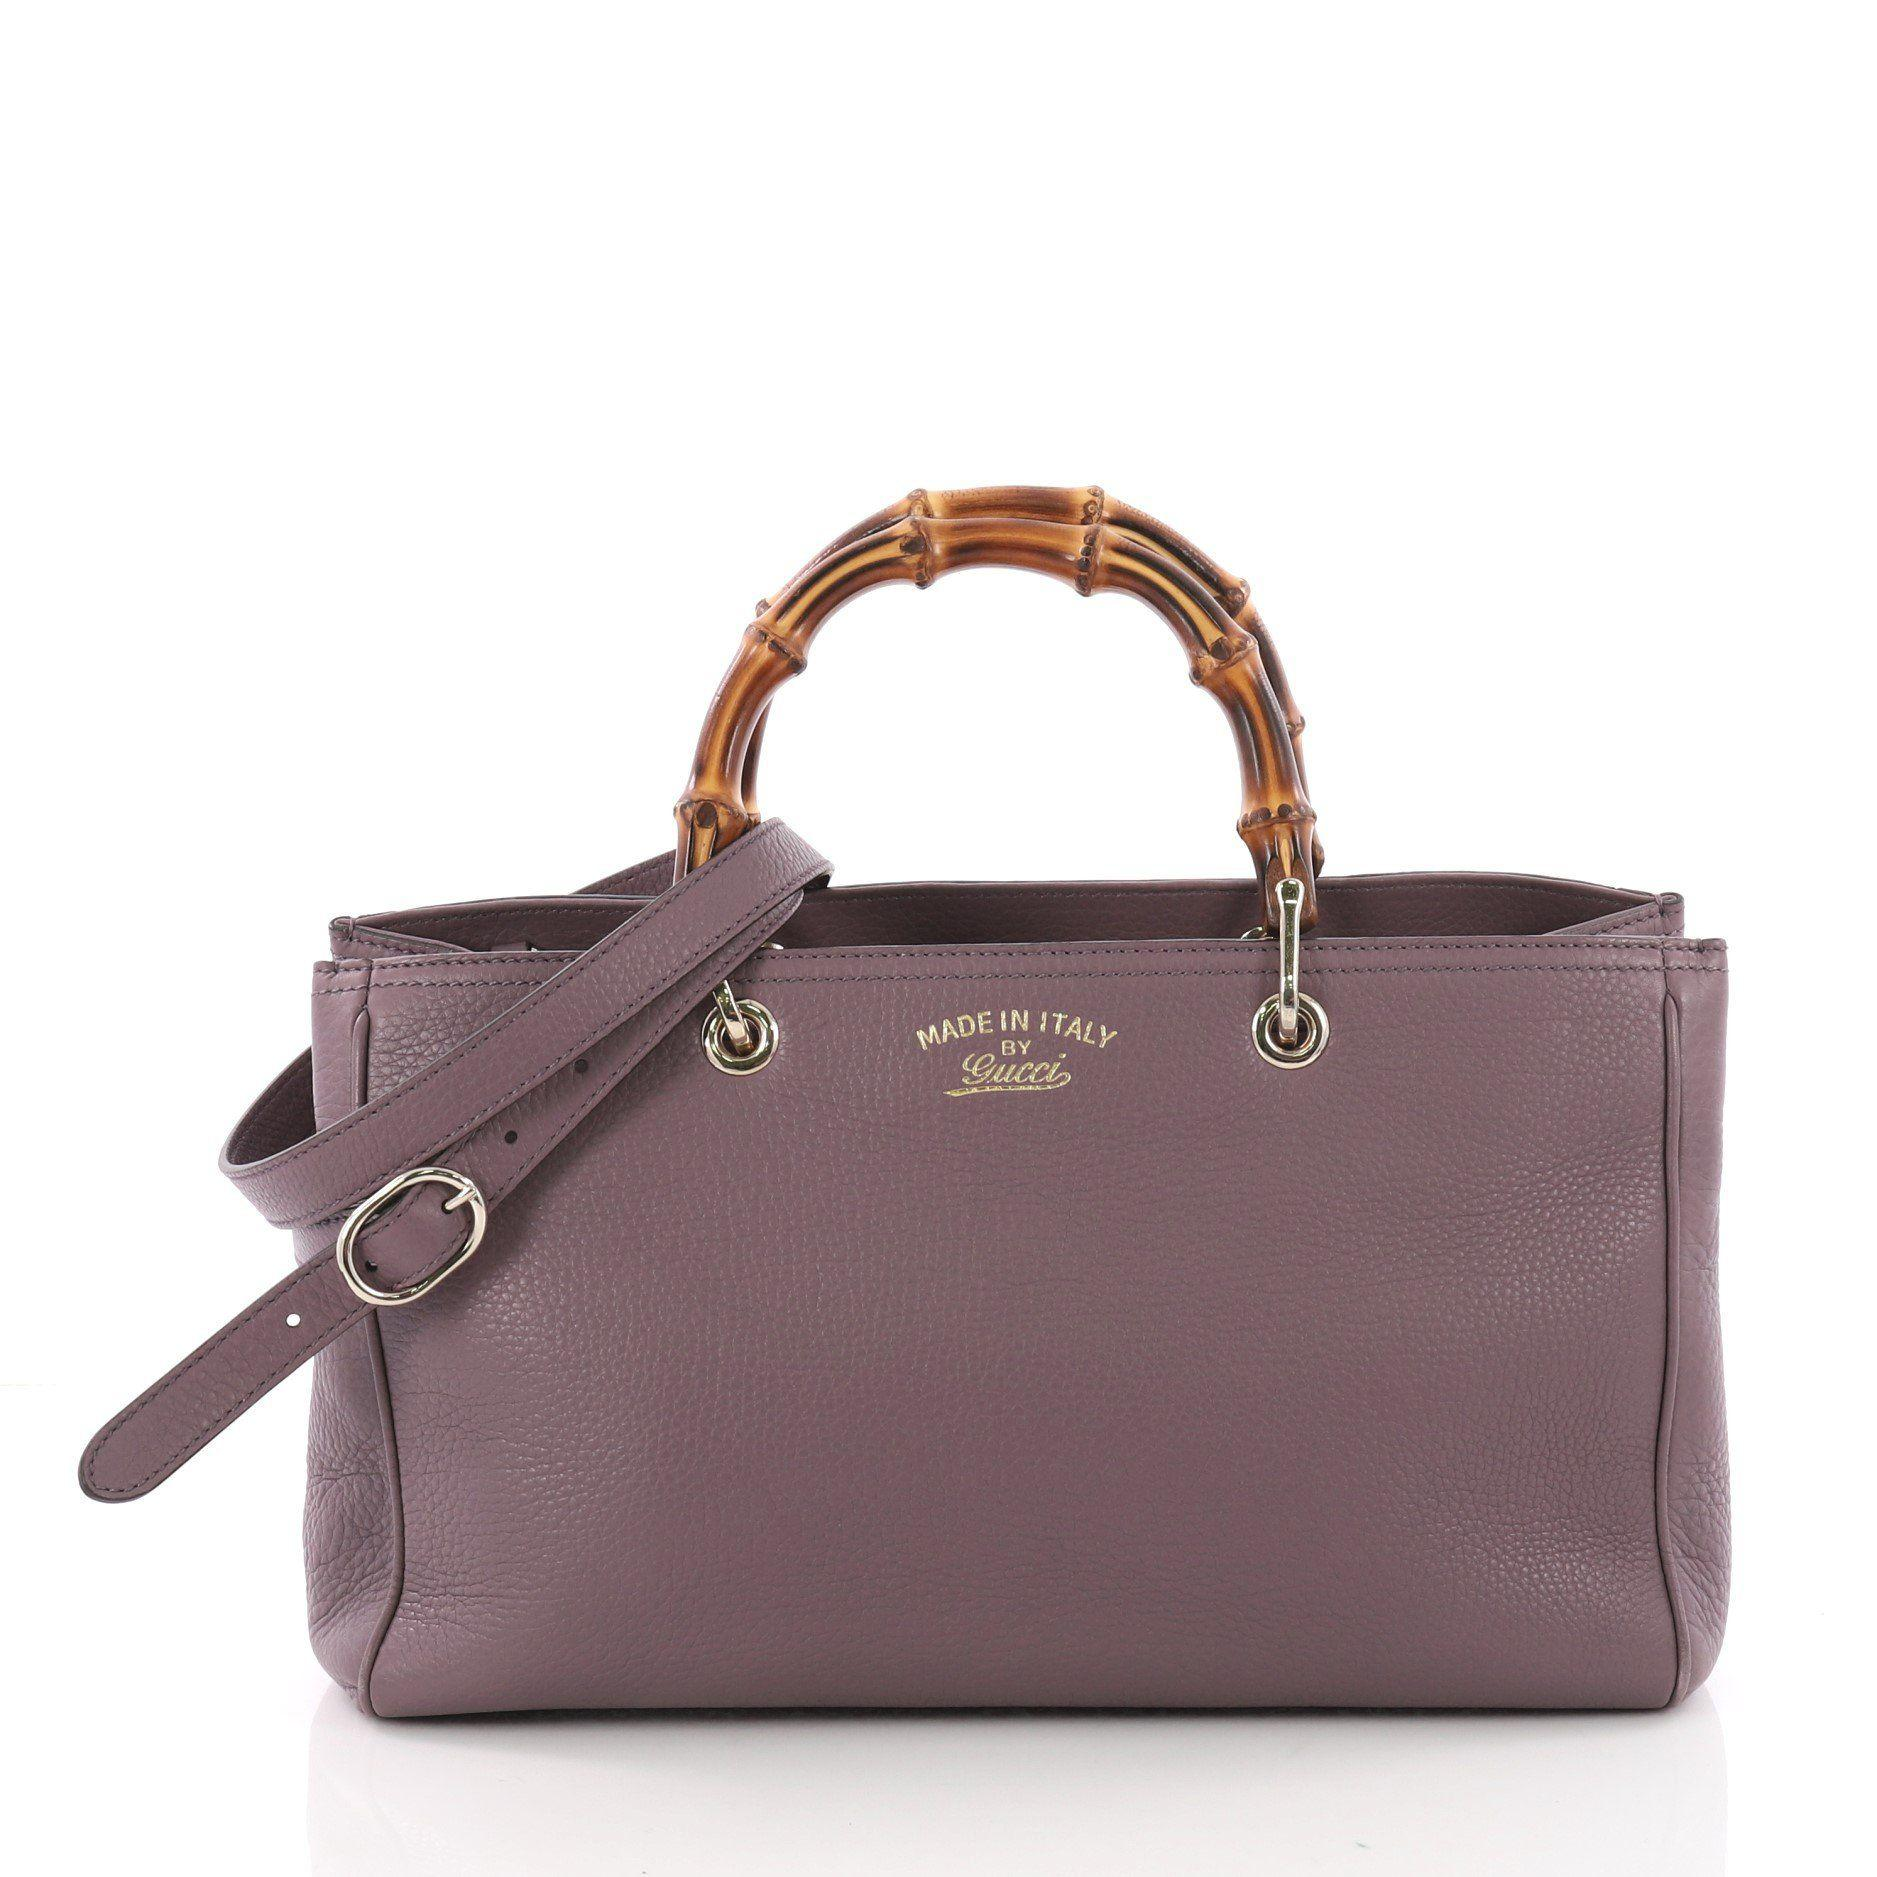 1bf19e8b870 Gucci - Purple Pre Owned Bamboo Shopper Tote Leather Medium - Lyst. View  fullscreen